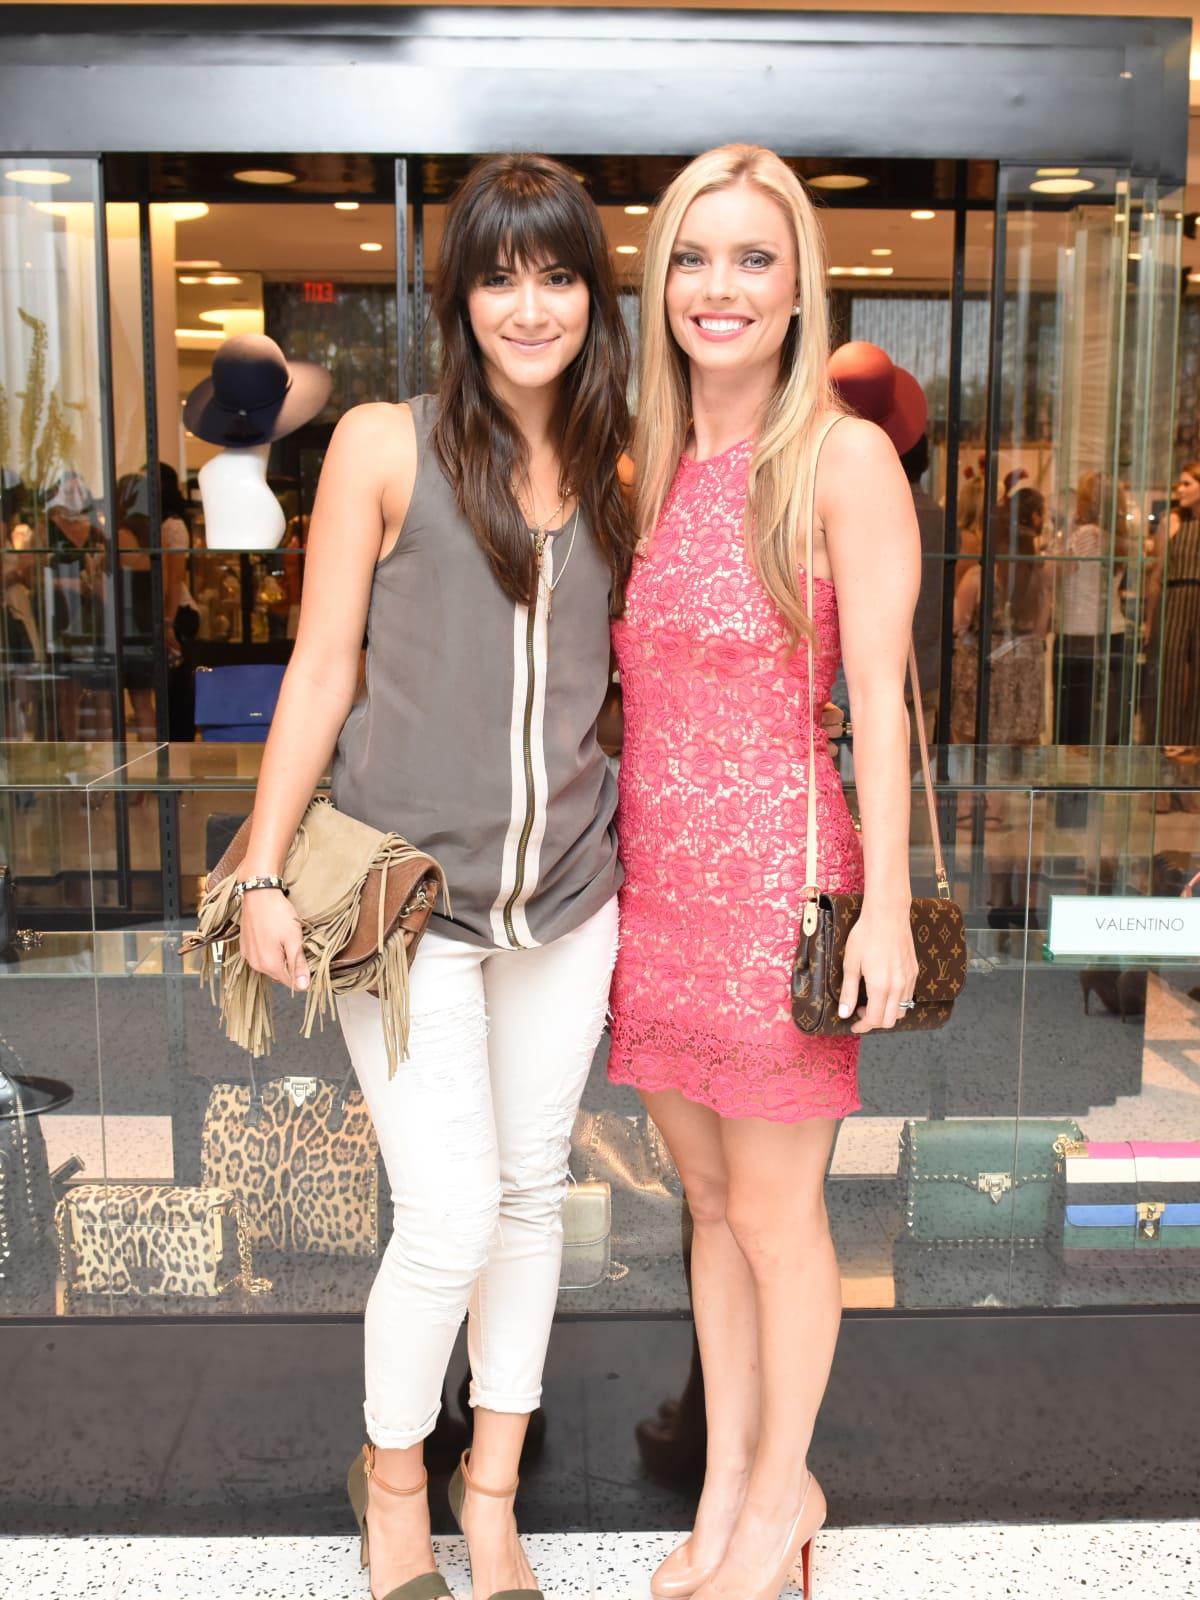 News, shelby, Fresh Faces of Fashion, Natalie Freeman, Ashley Gooch